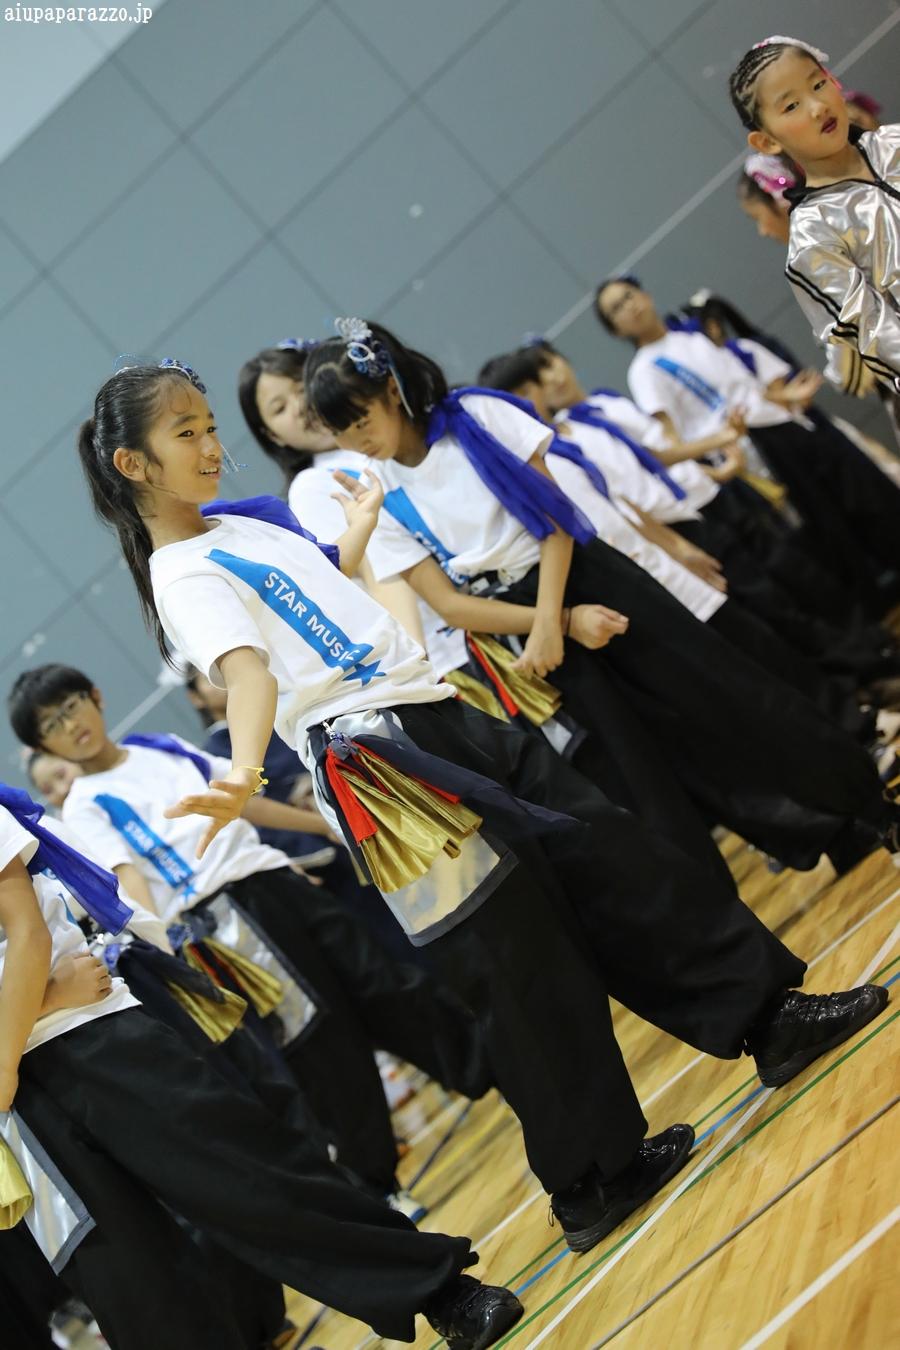 sm2016kawa_16.jpg